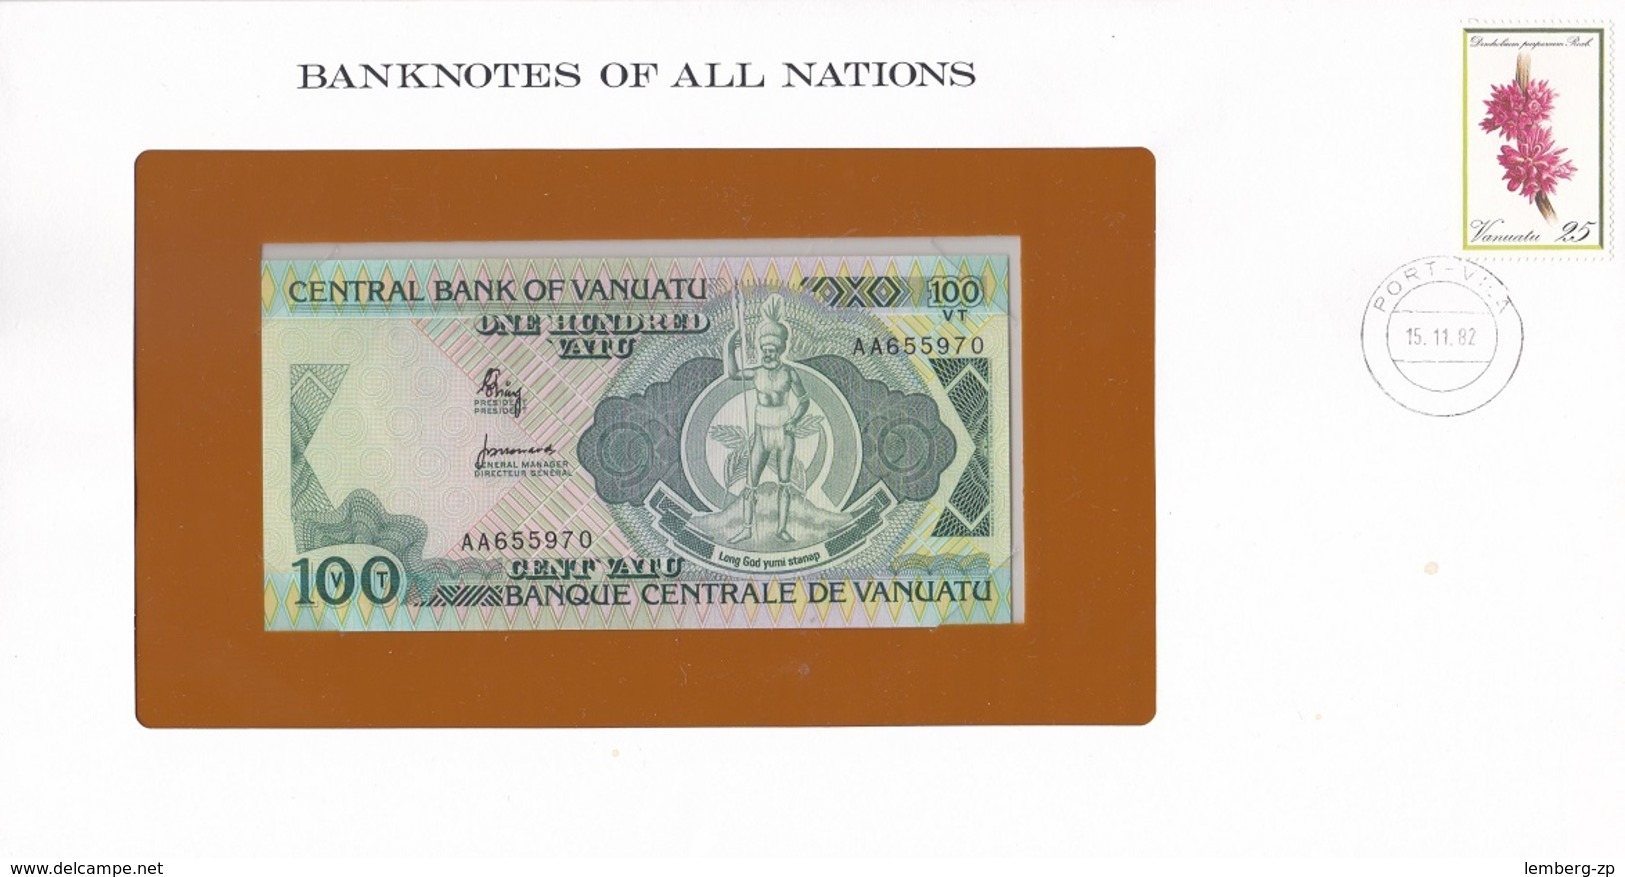 Vanuatu - 100 Vatu 1982 UNC P. 1 Serie AA Banknotes Of All Nations Lemberg-Zp - Vanuatu